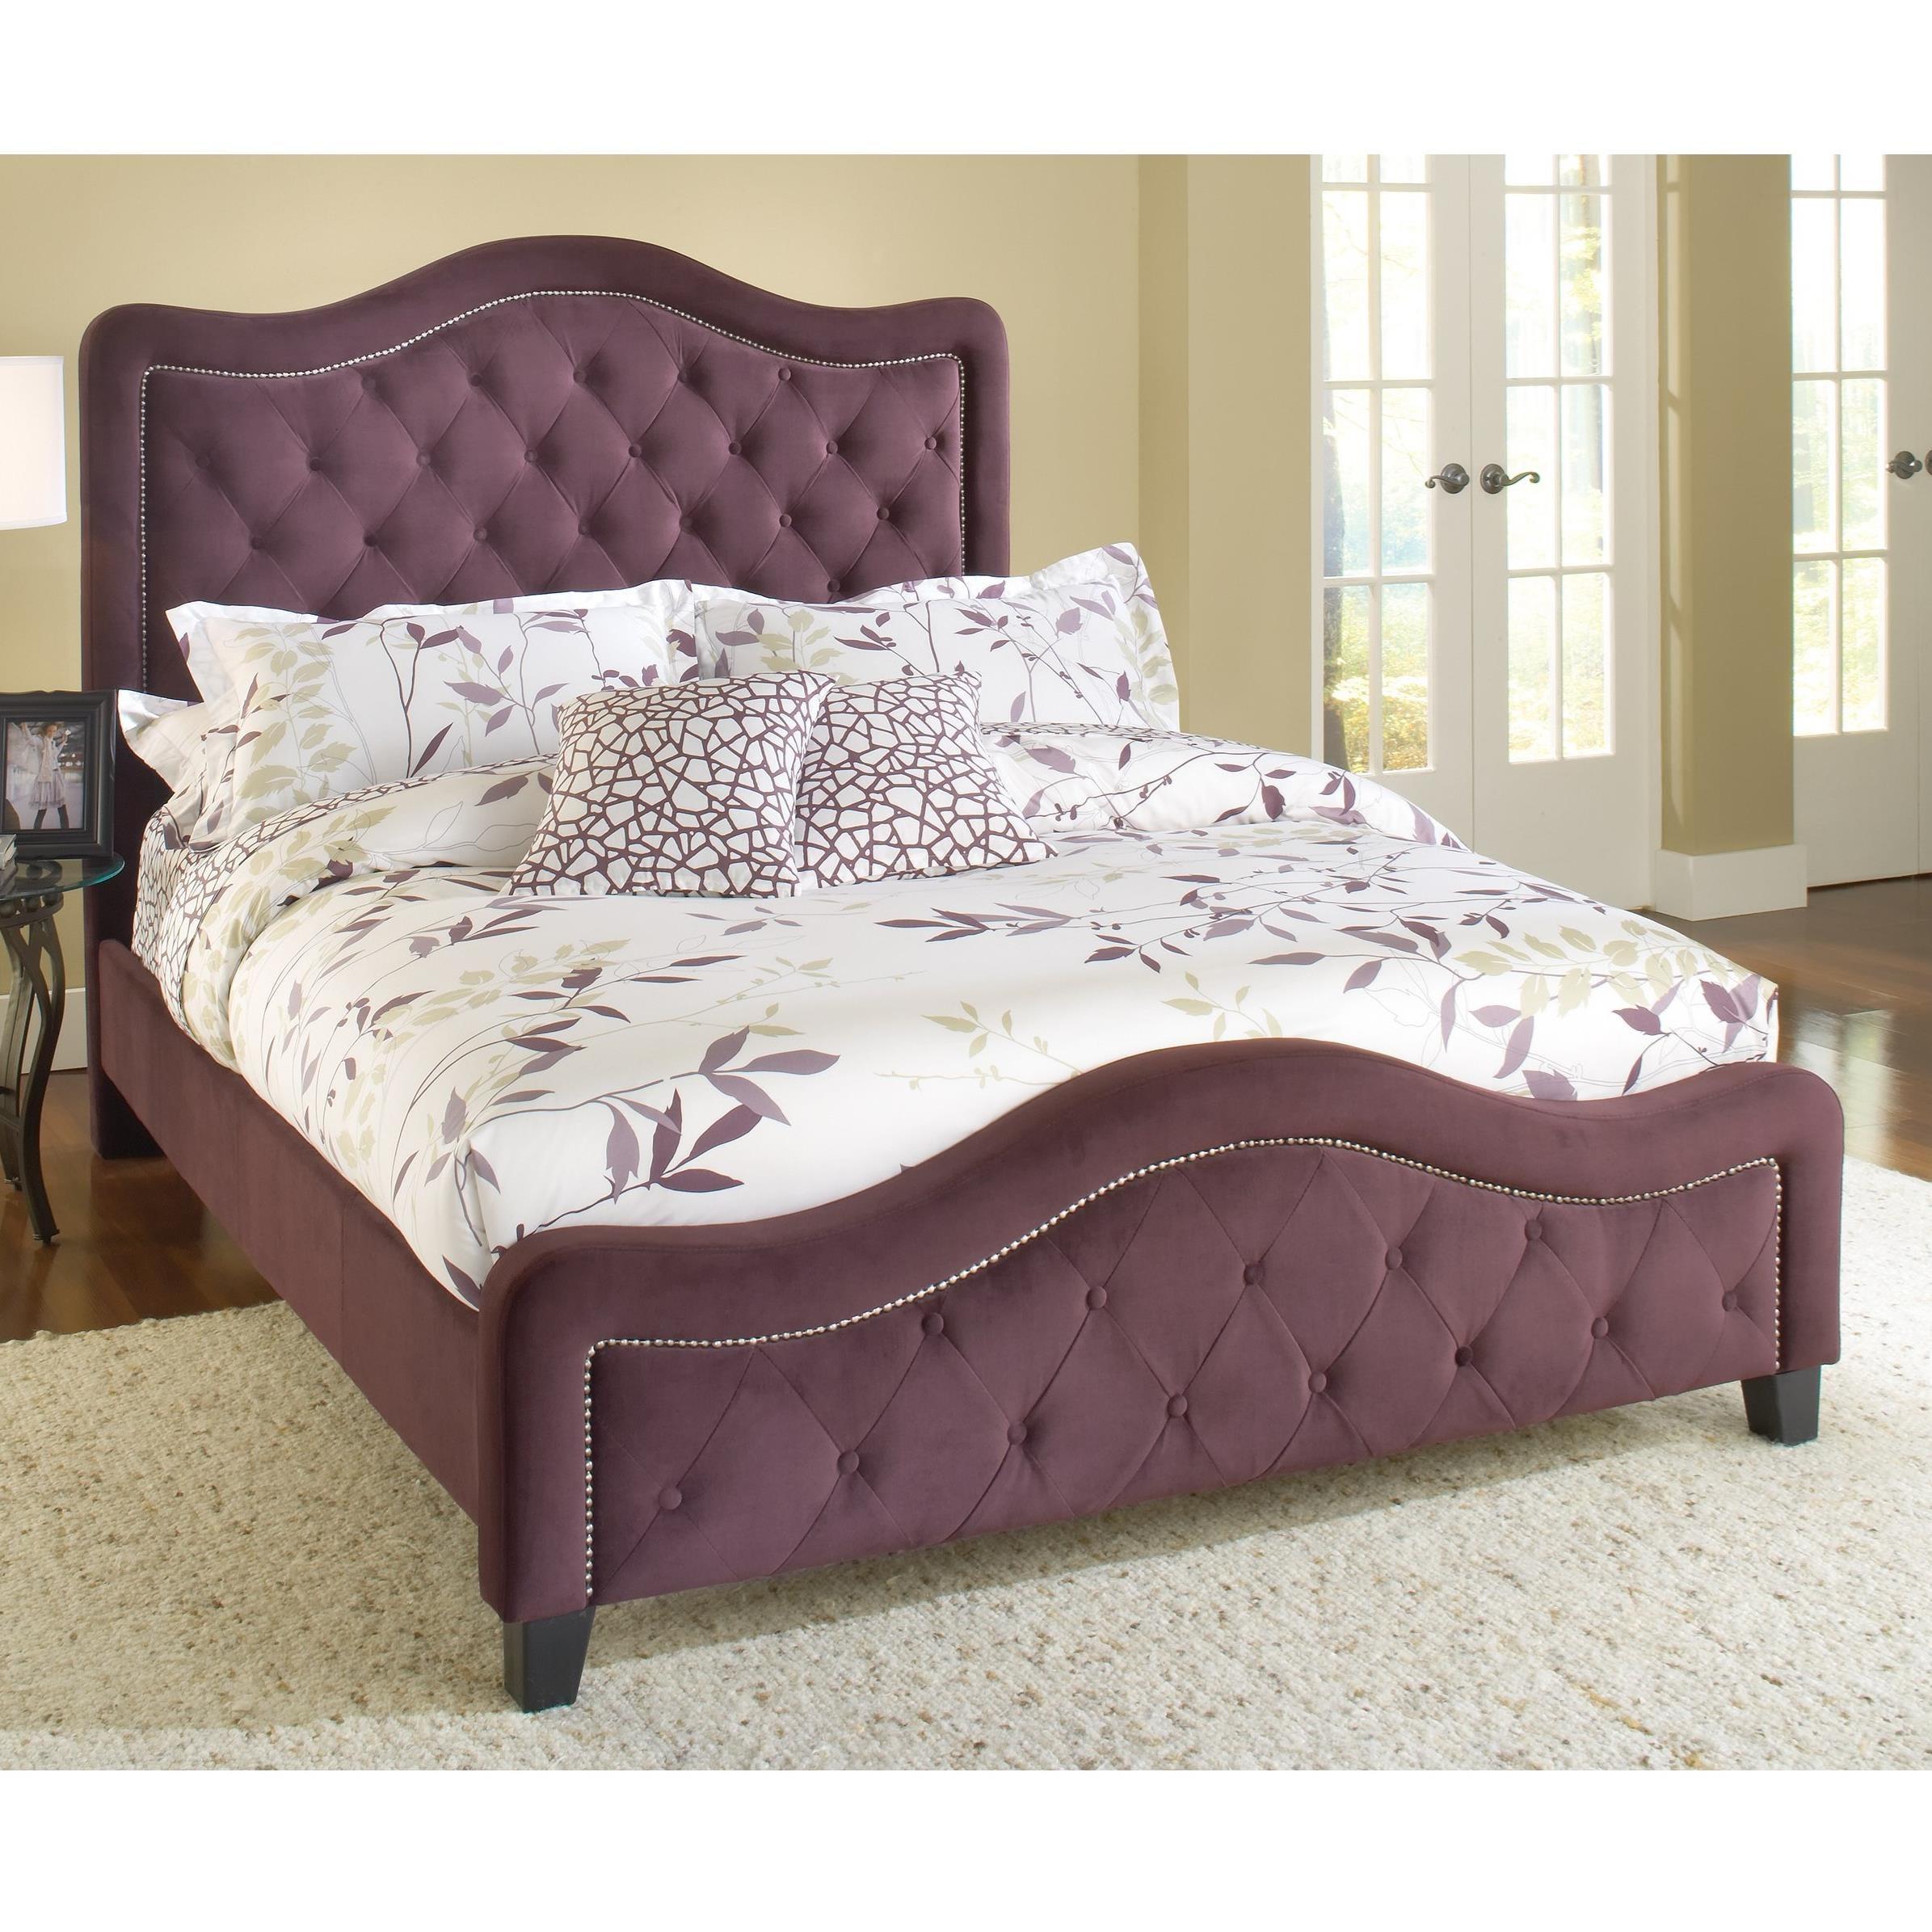 Hillsdale Upholstered Beds King Trieste Fabric Bed  - Item Number: 1758BKR